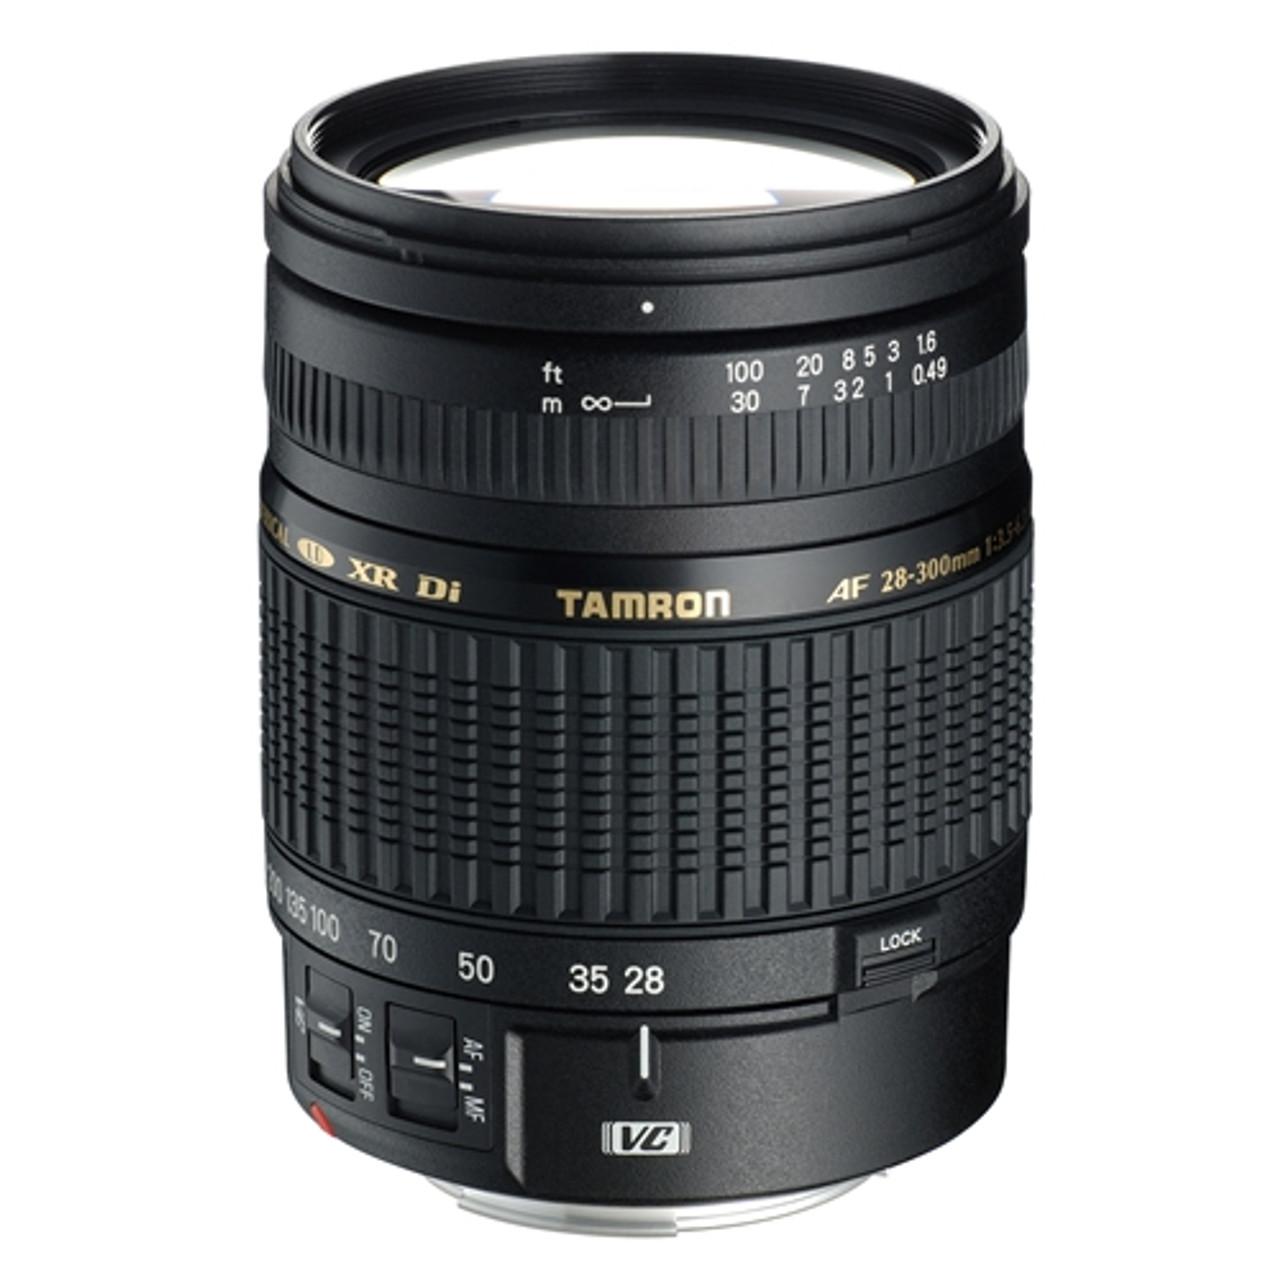 TAMRON  28-300MM F3.5-6.3  DI VC PZD (NIKON)